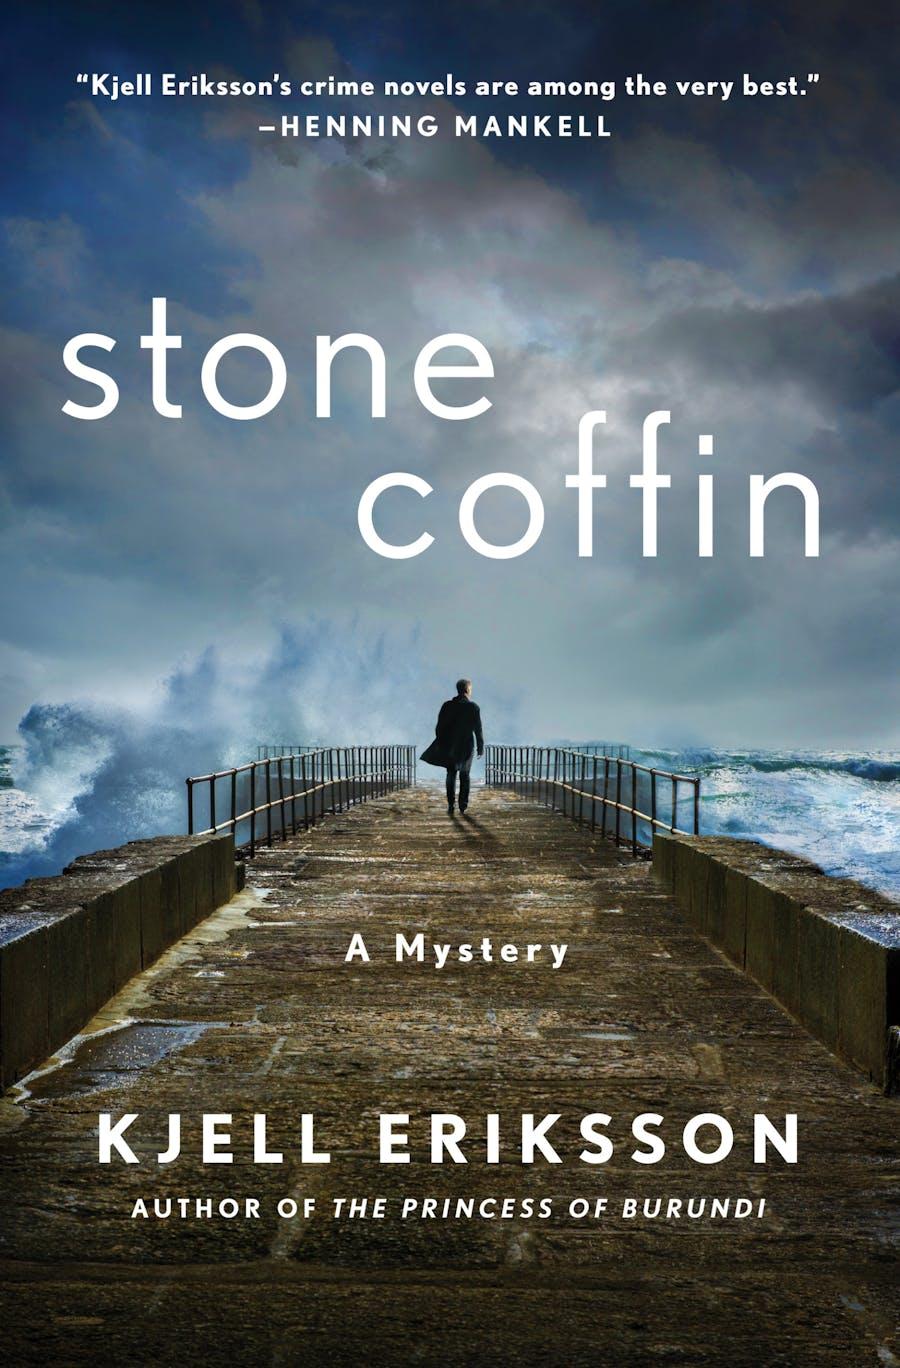 Stone Coffin by Kjell Eriksson; translated by Ebba Segerberg